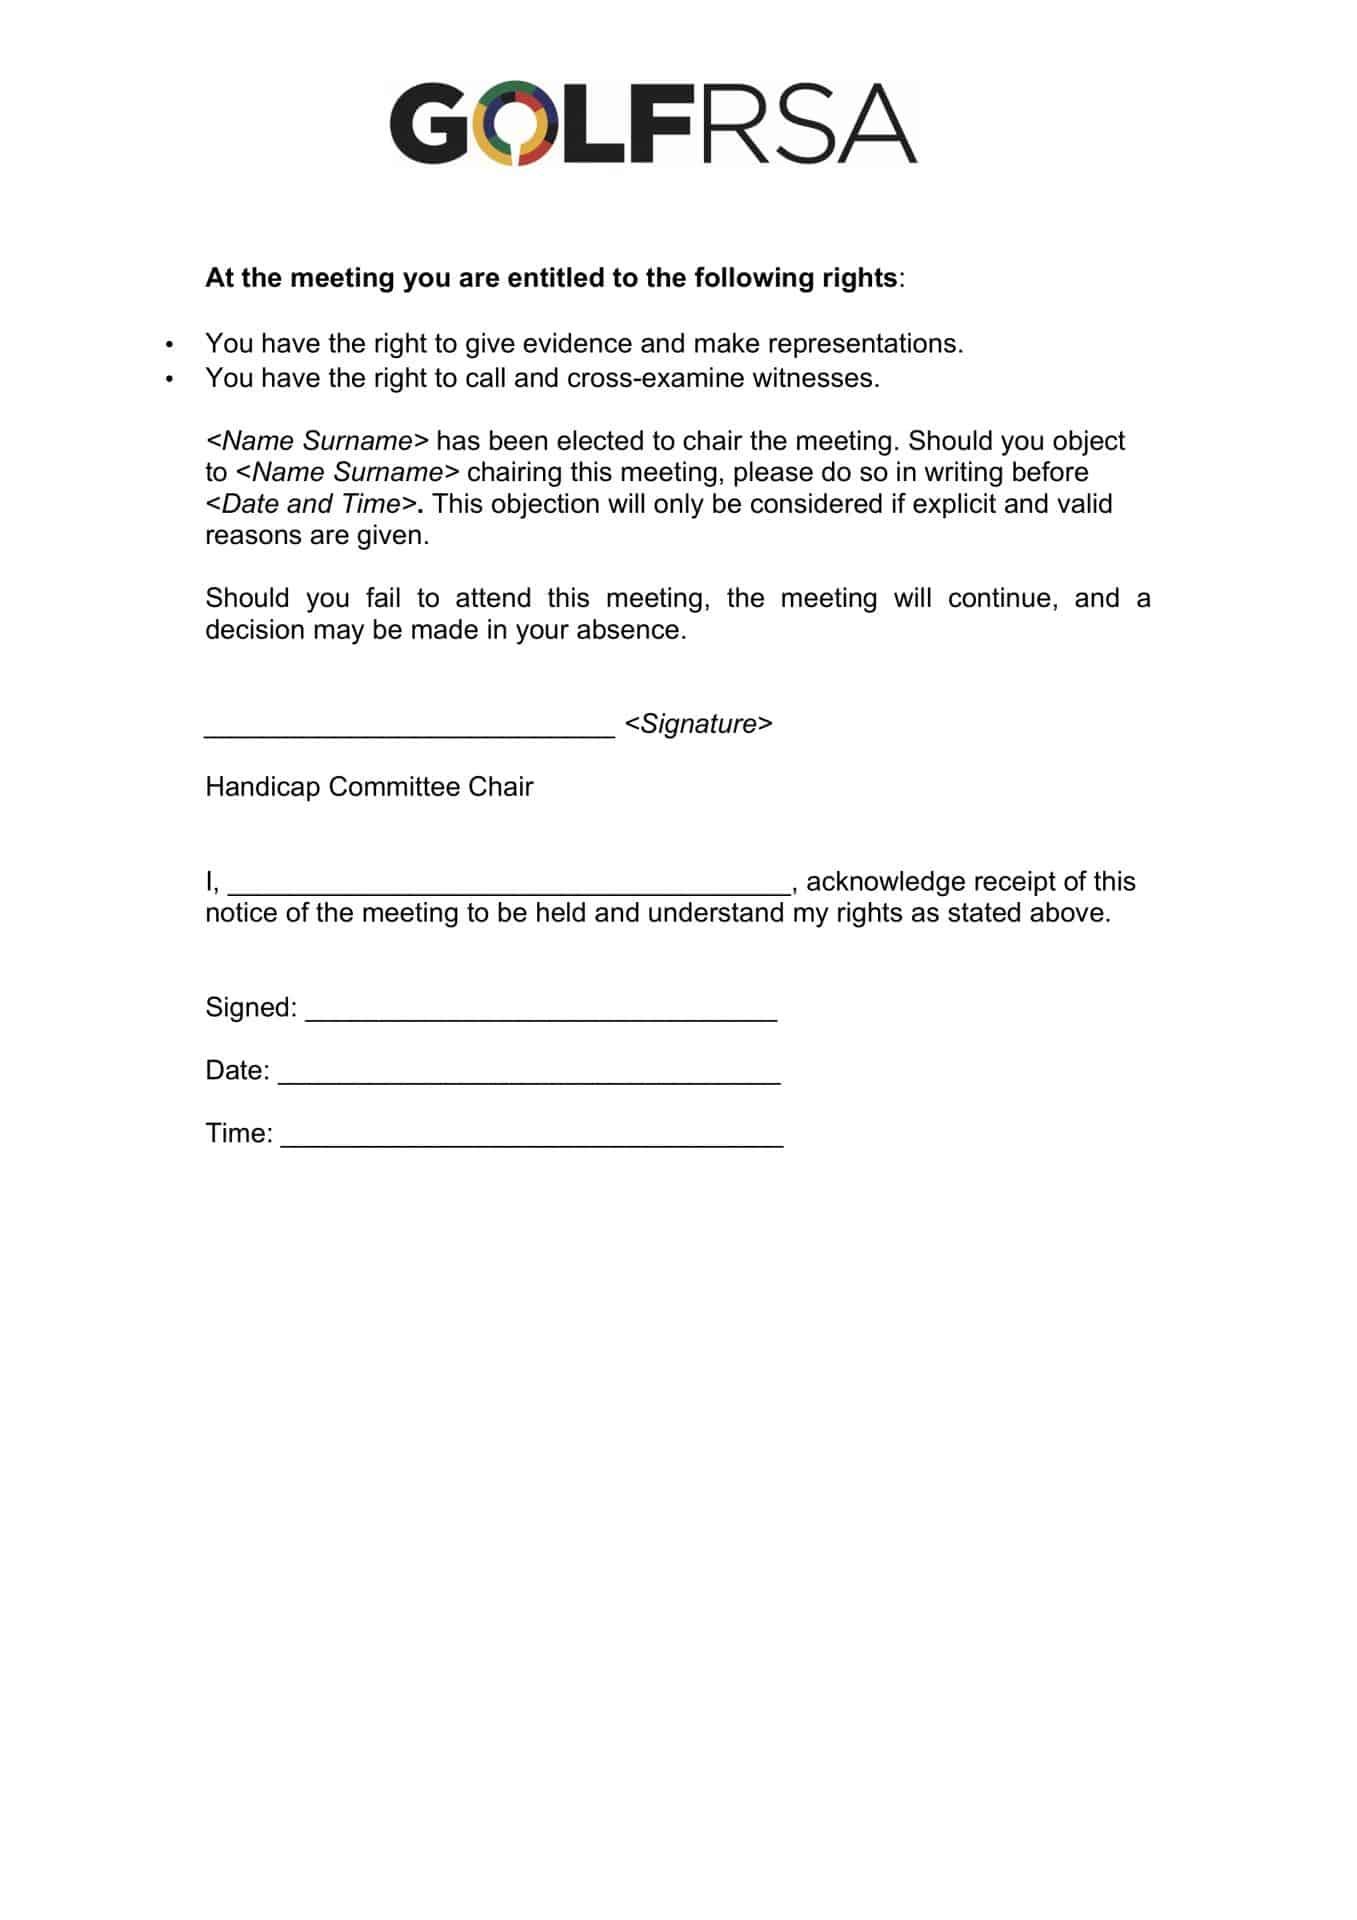 GolfRSA Notice of meeting template 2